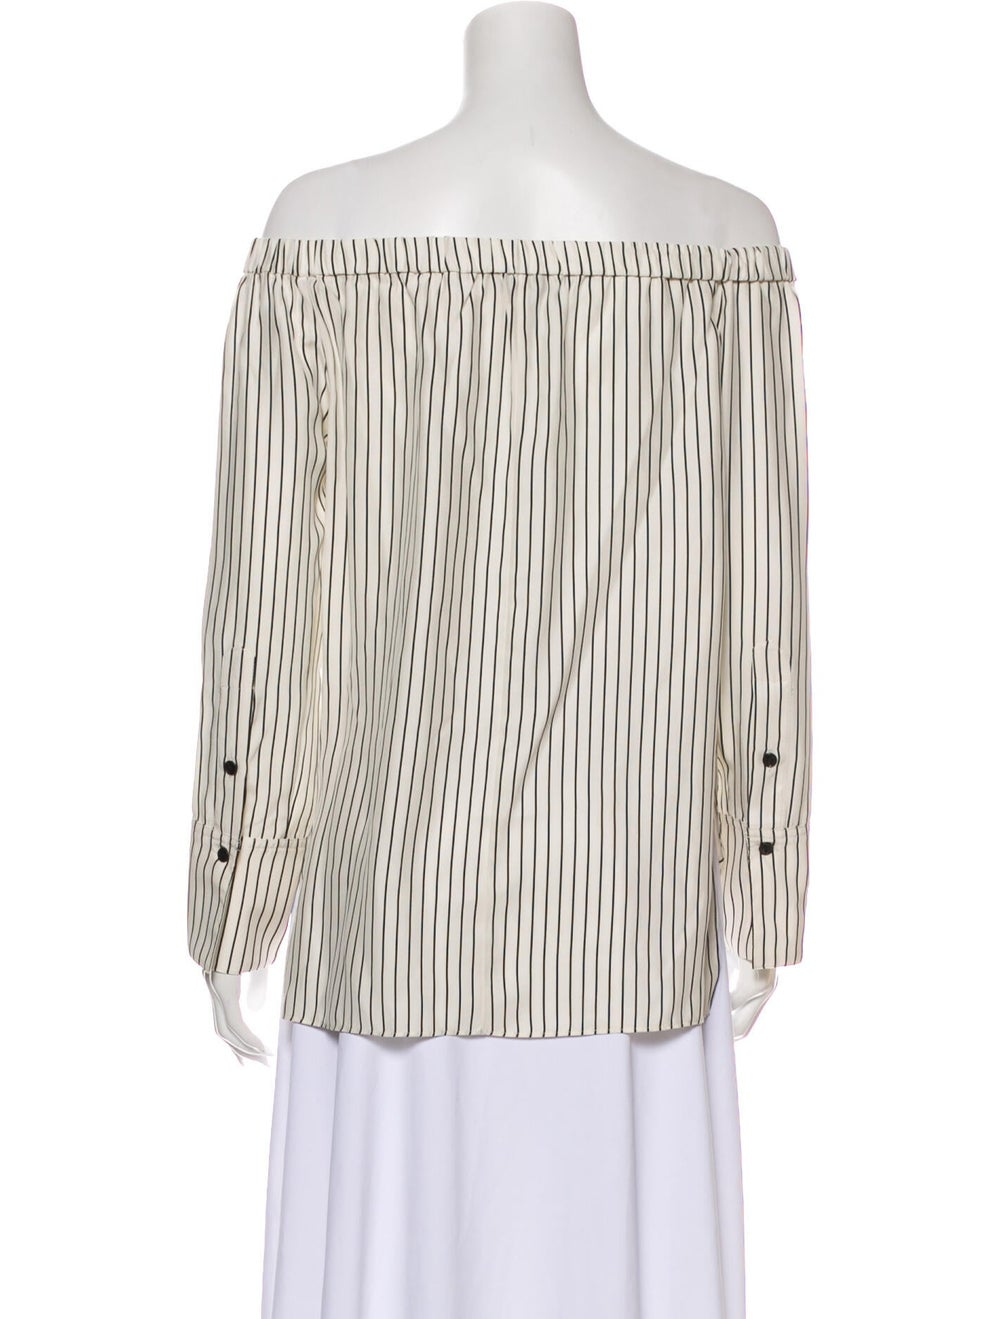 Rag & Bone Silk Striped Blouse - image 3